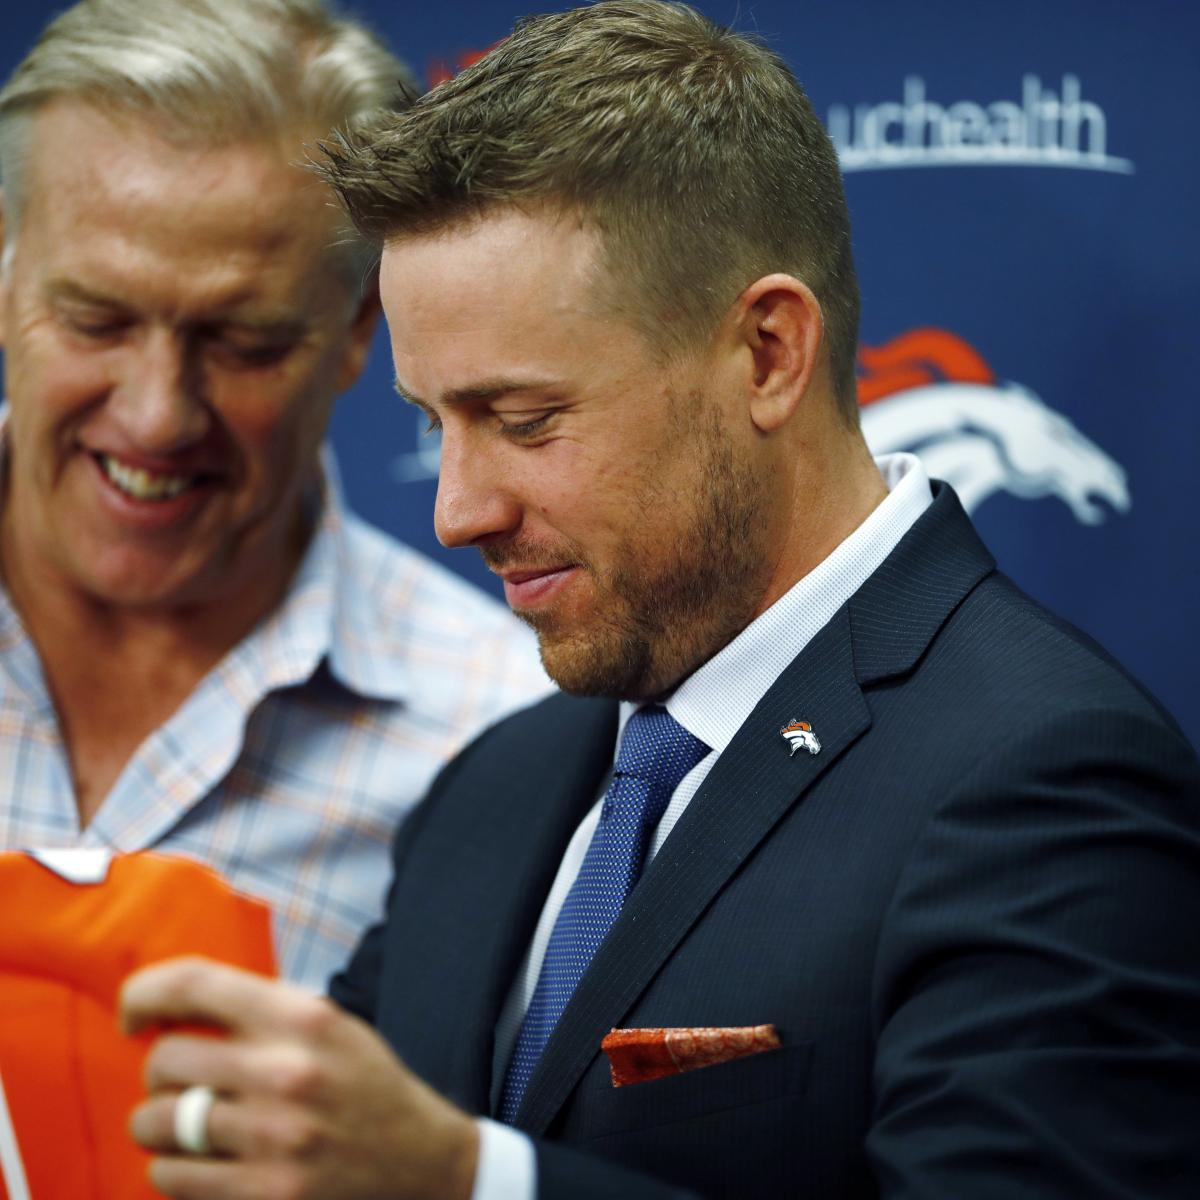 2018 Denver Broncos Schedule: Full Listing Of Dates, Times